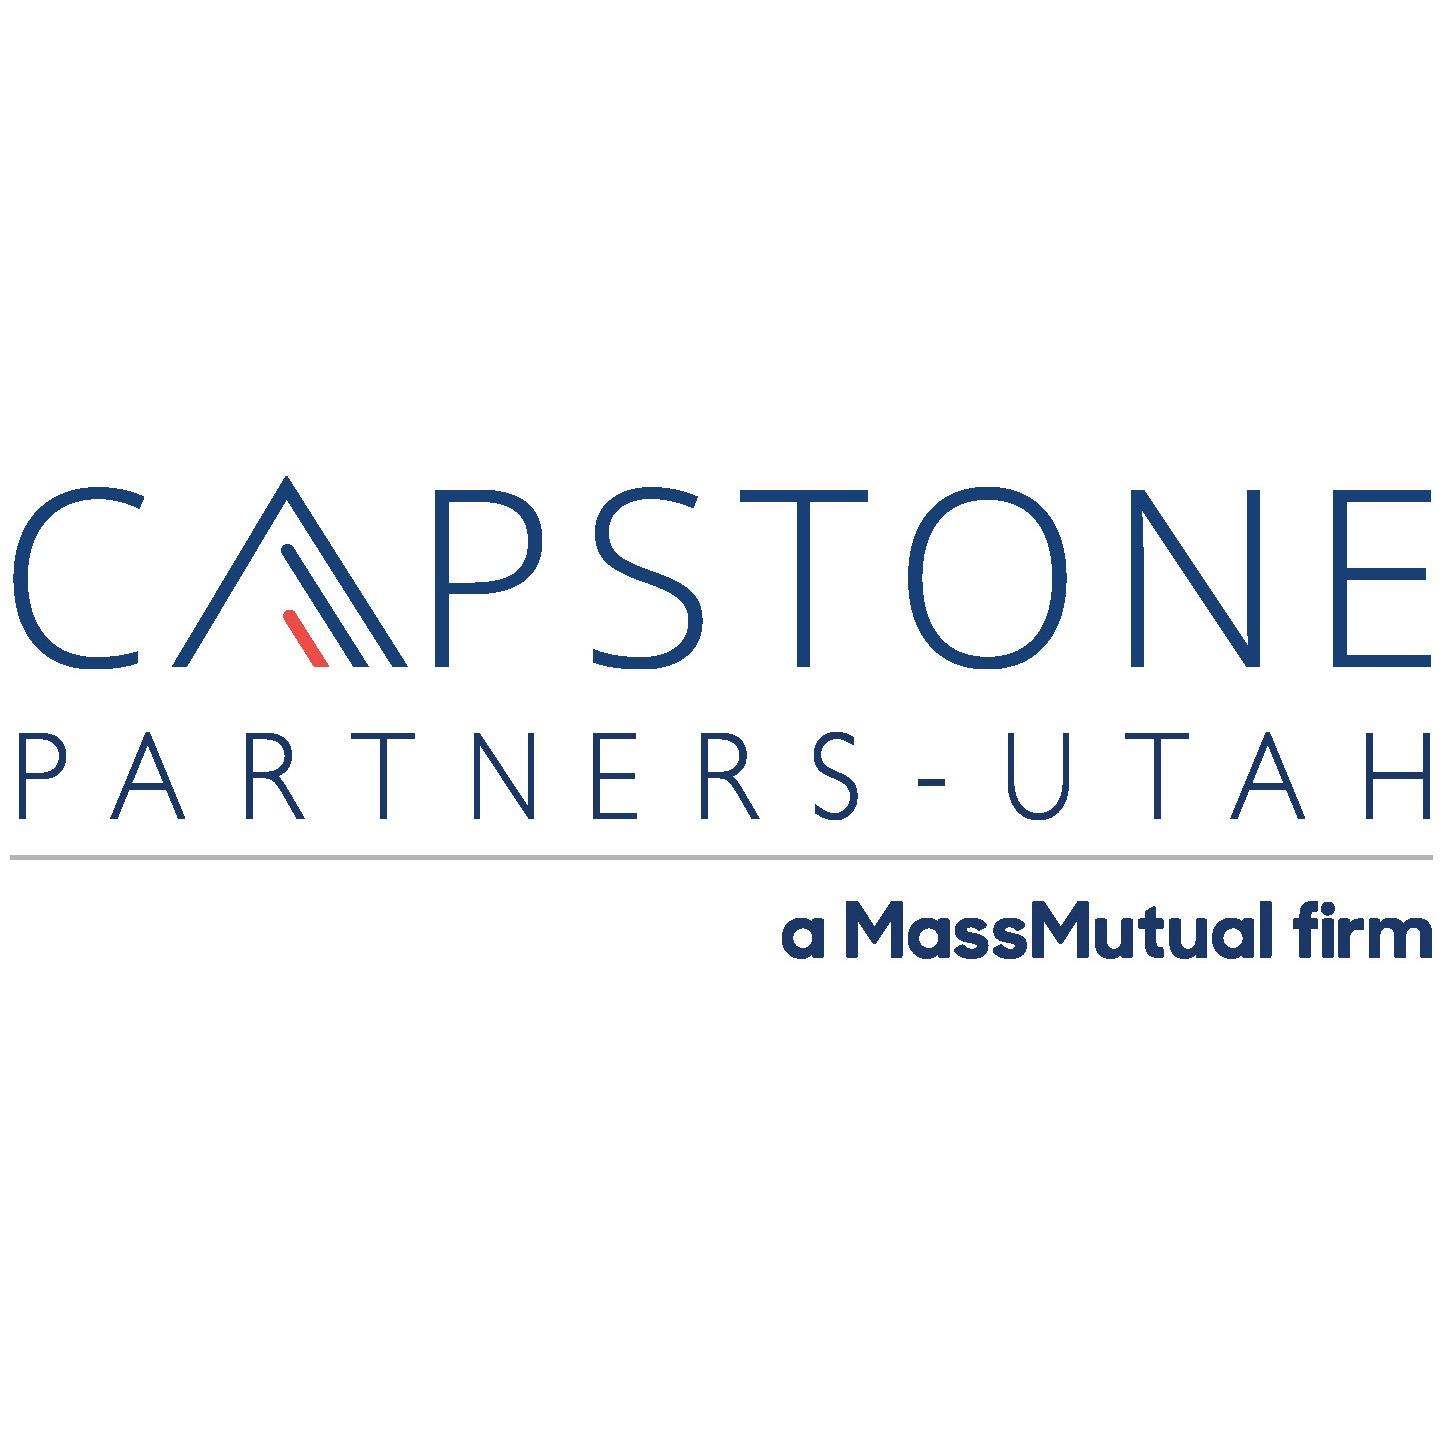 Capstone Partners - Utah